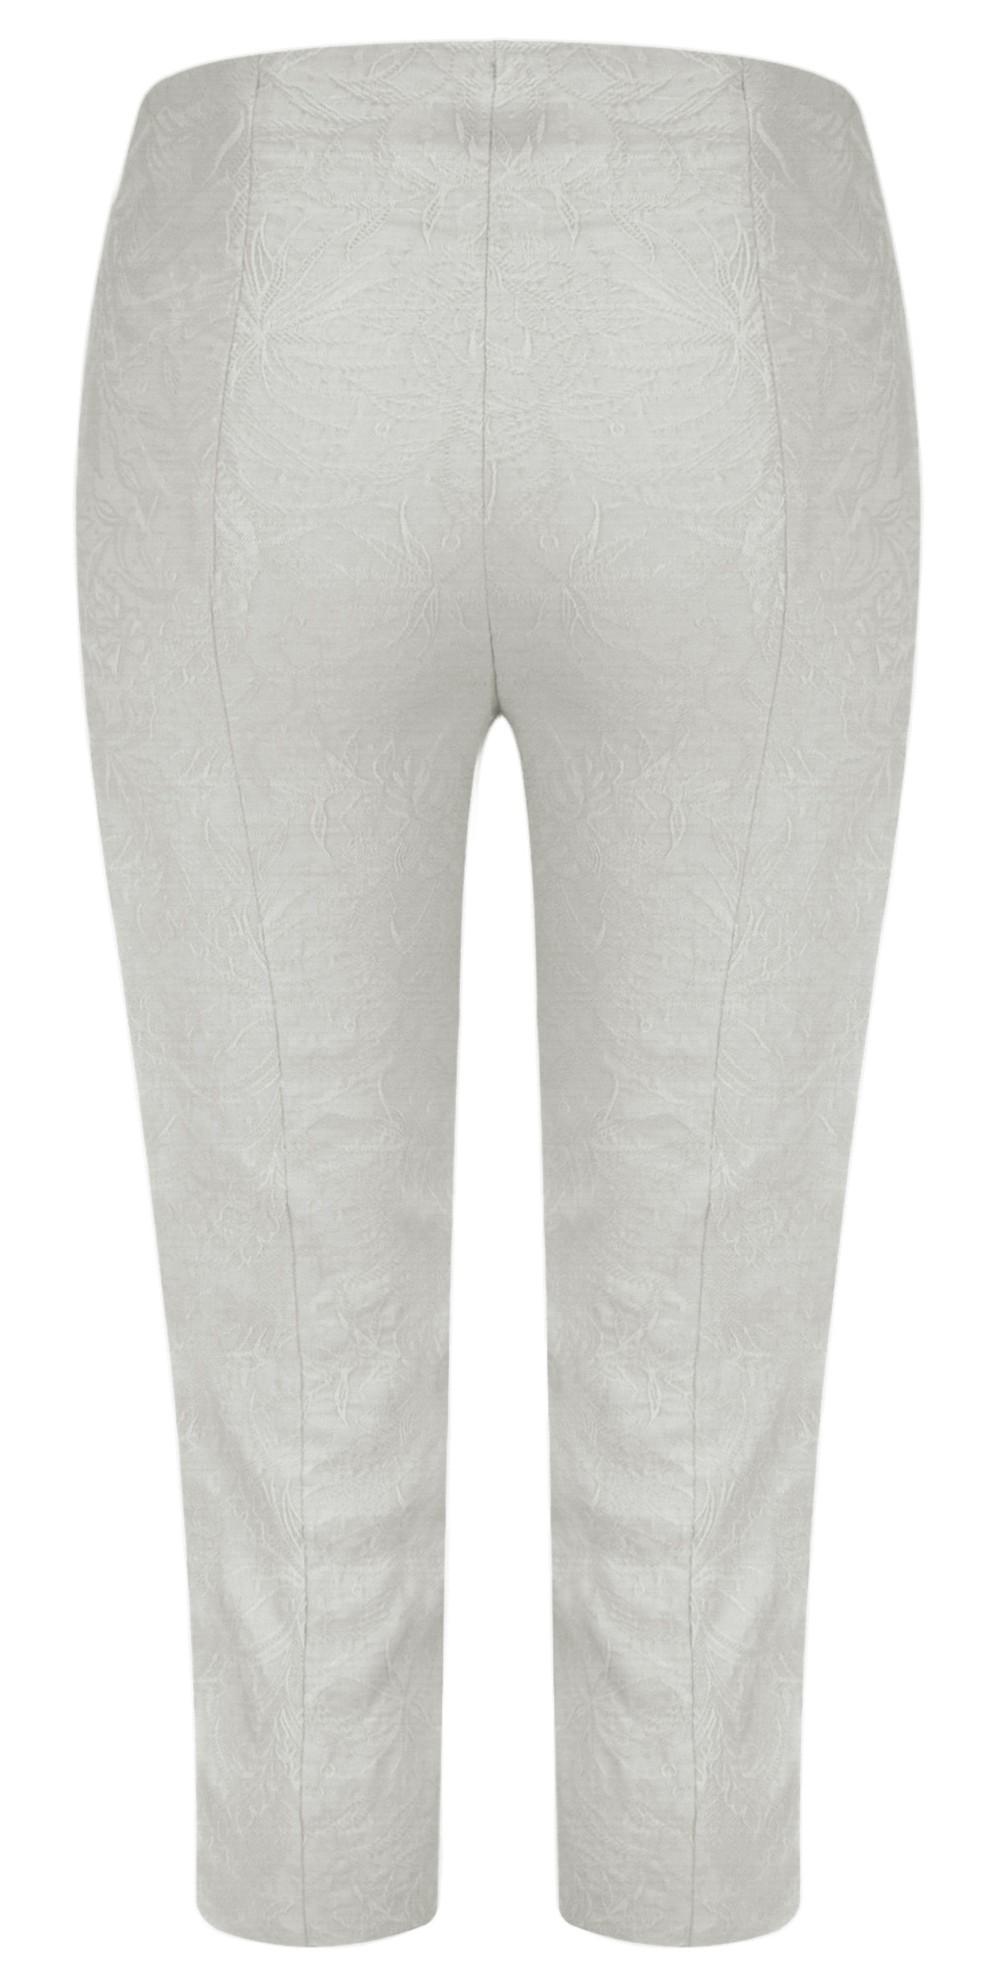 Marie 07 Grey Jacquard Crop Trouser main image